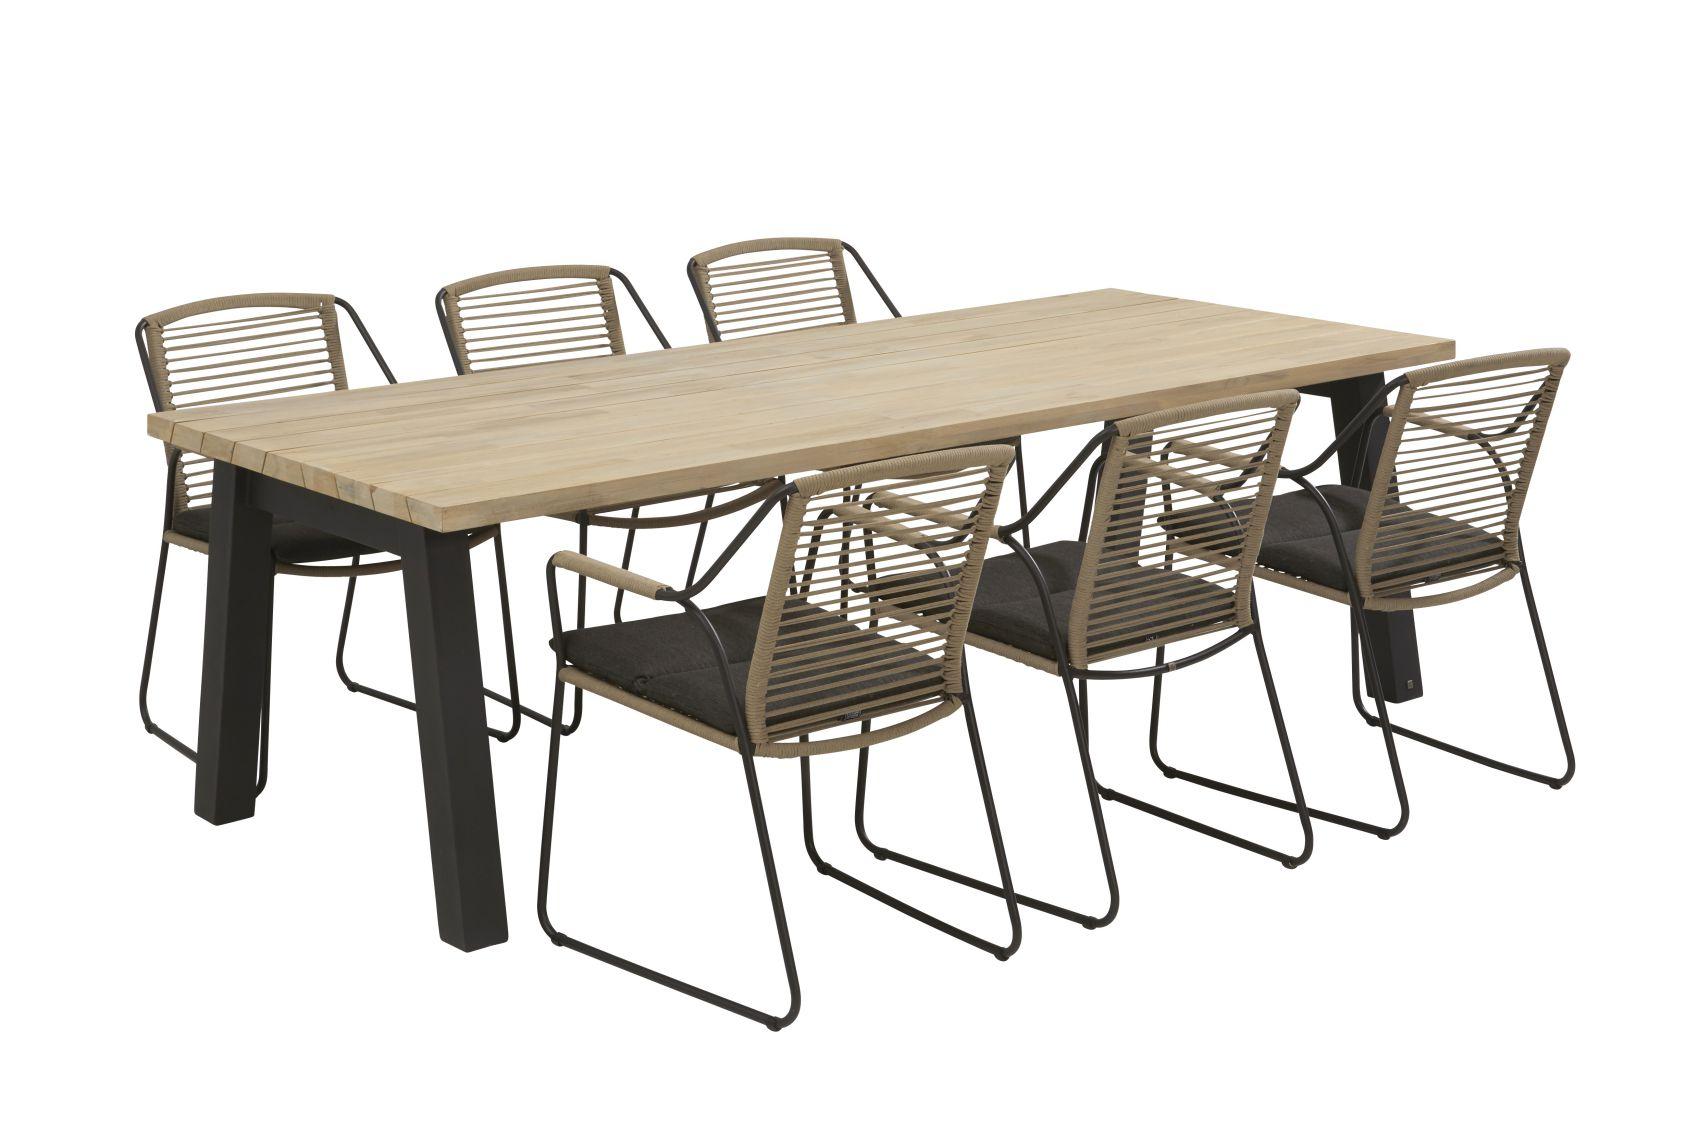 4 seasons outdoor scandic dining set derby dining tafel teak top met aluminium poten sale. Black Bedroom Furniture Sets. Home Design Ideas